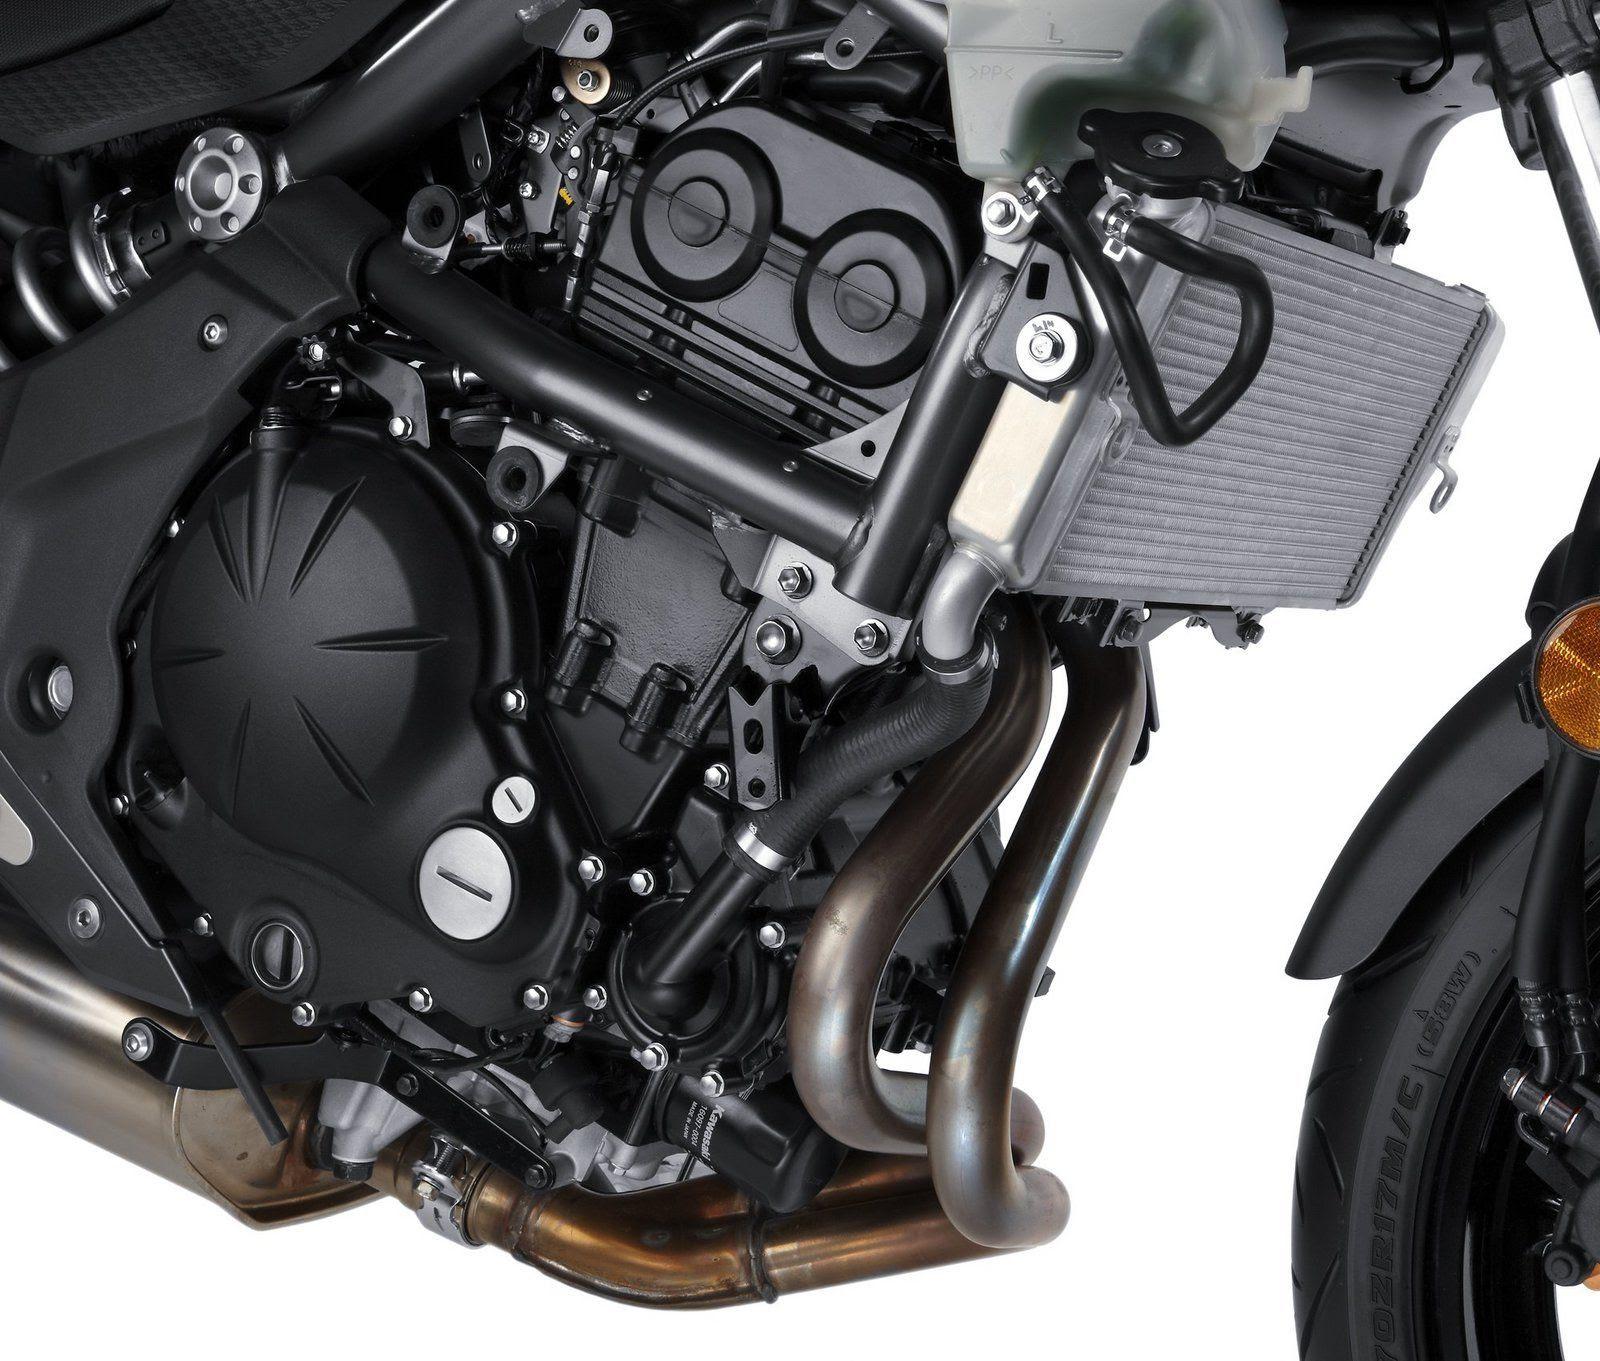 650cc Engine Swap Kawasaki Ninja 300 Forum